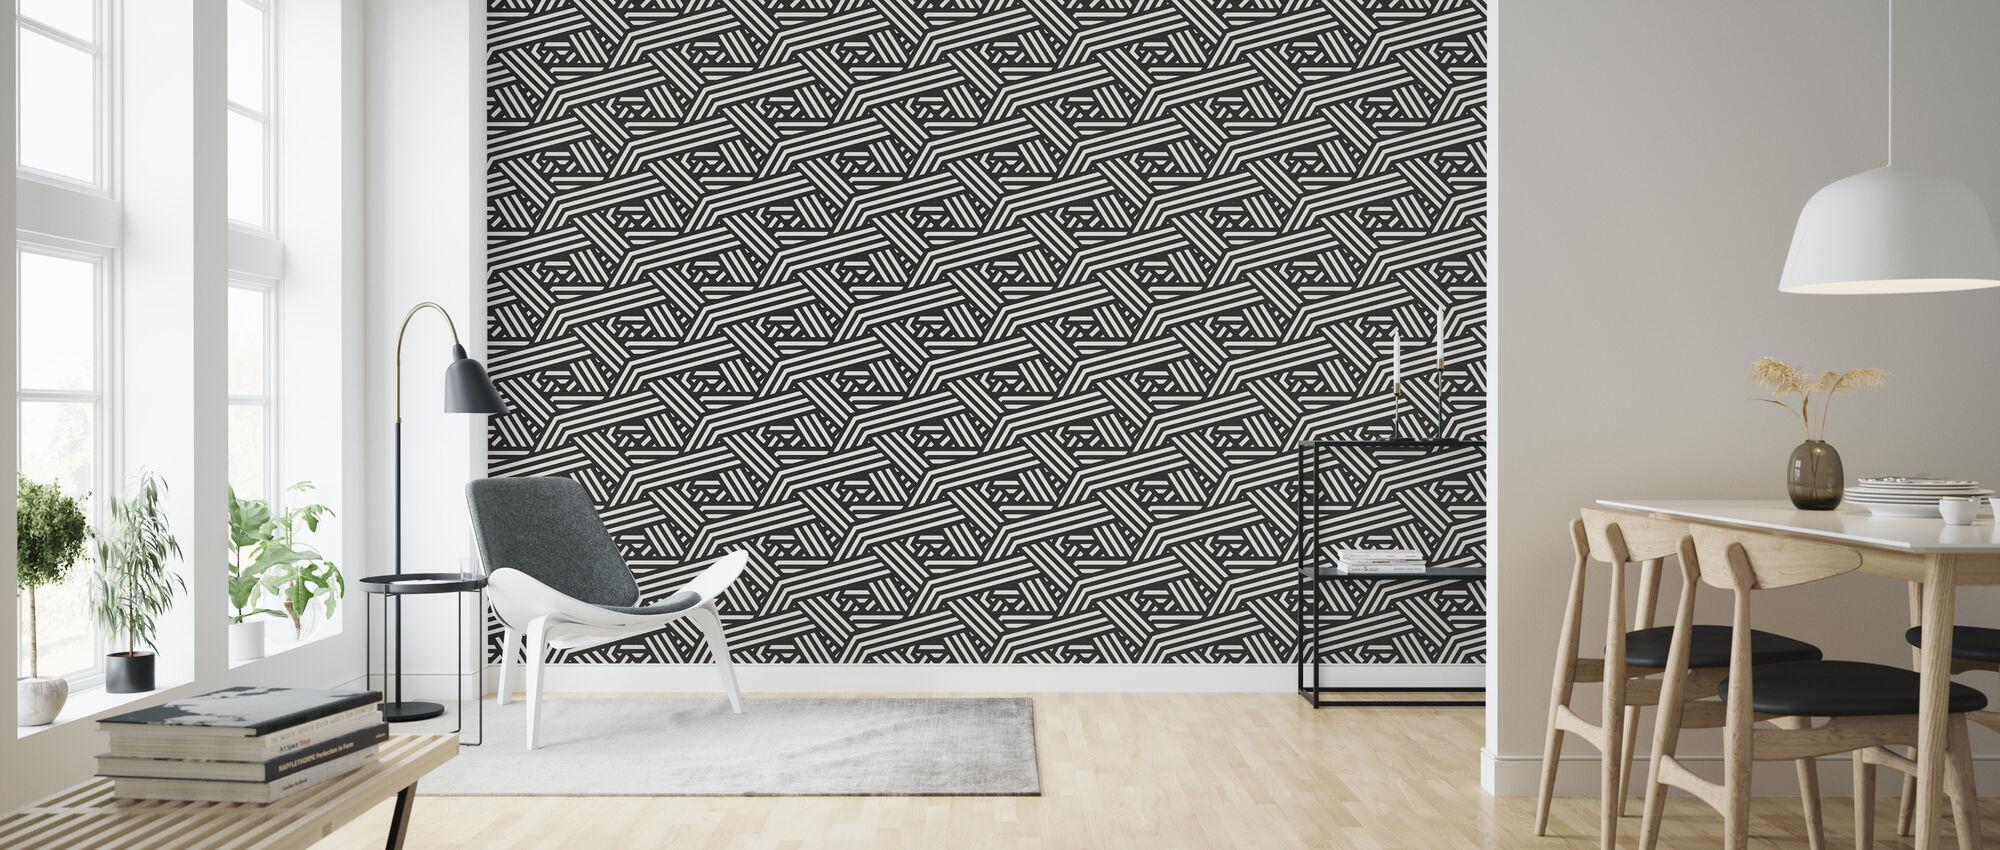 Stitches - Wallpaper - Living Room